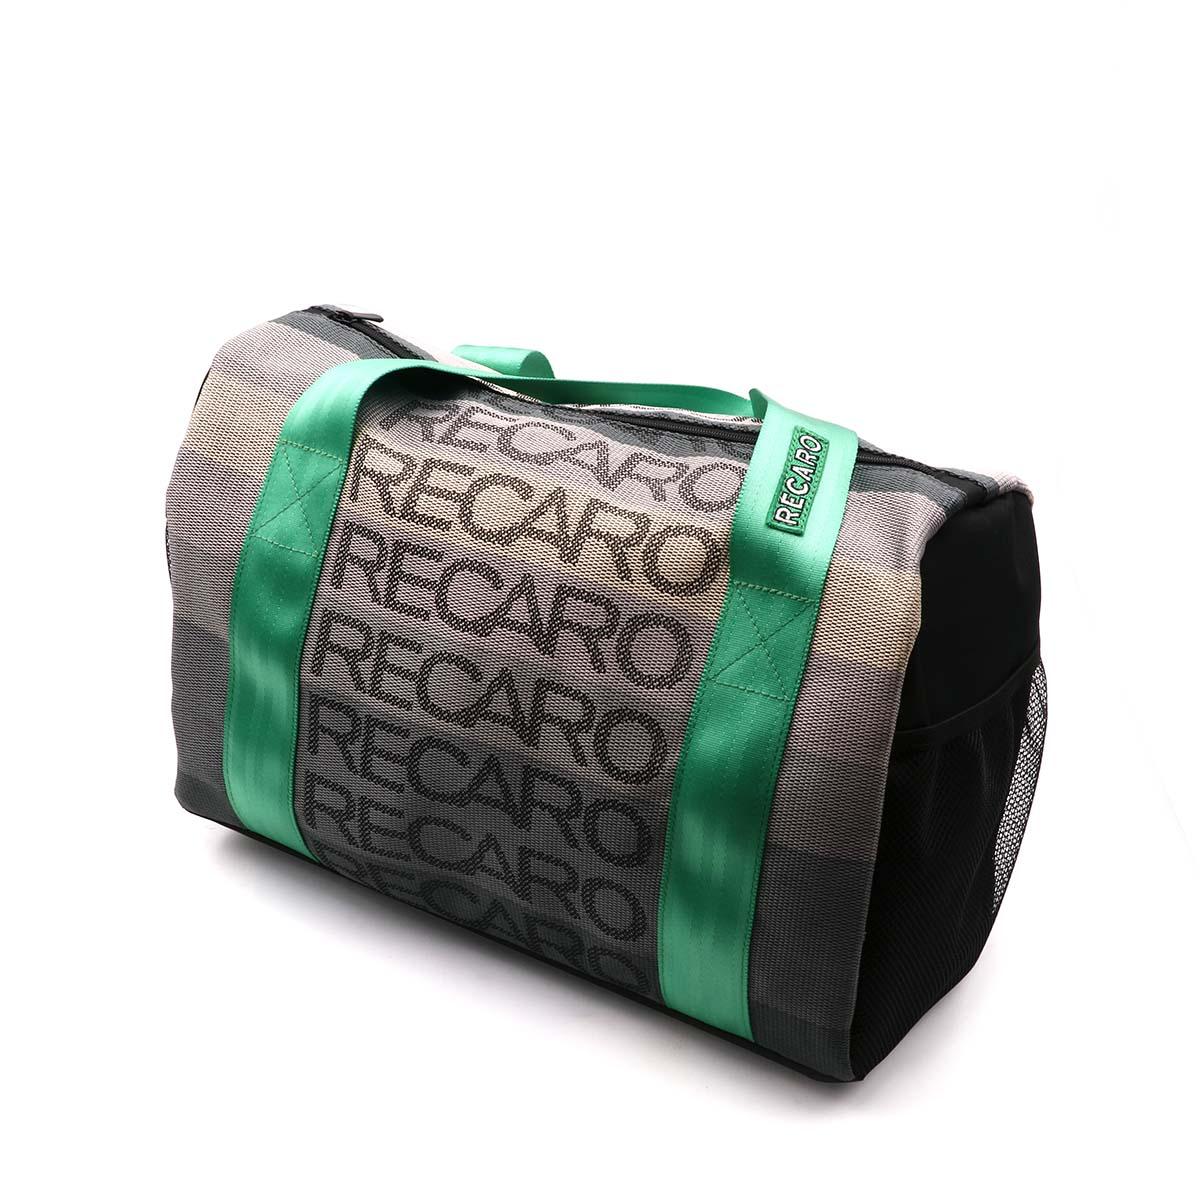 JDM RECARO Racing Fabric Canvas Handbag Messager Duffle School Bags Outdoor Traveling Bag